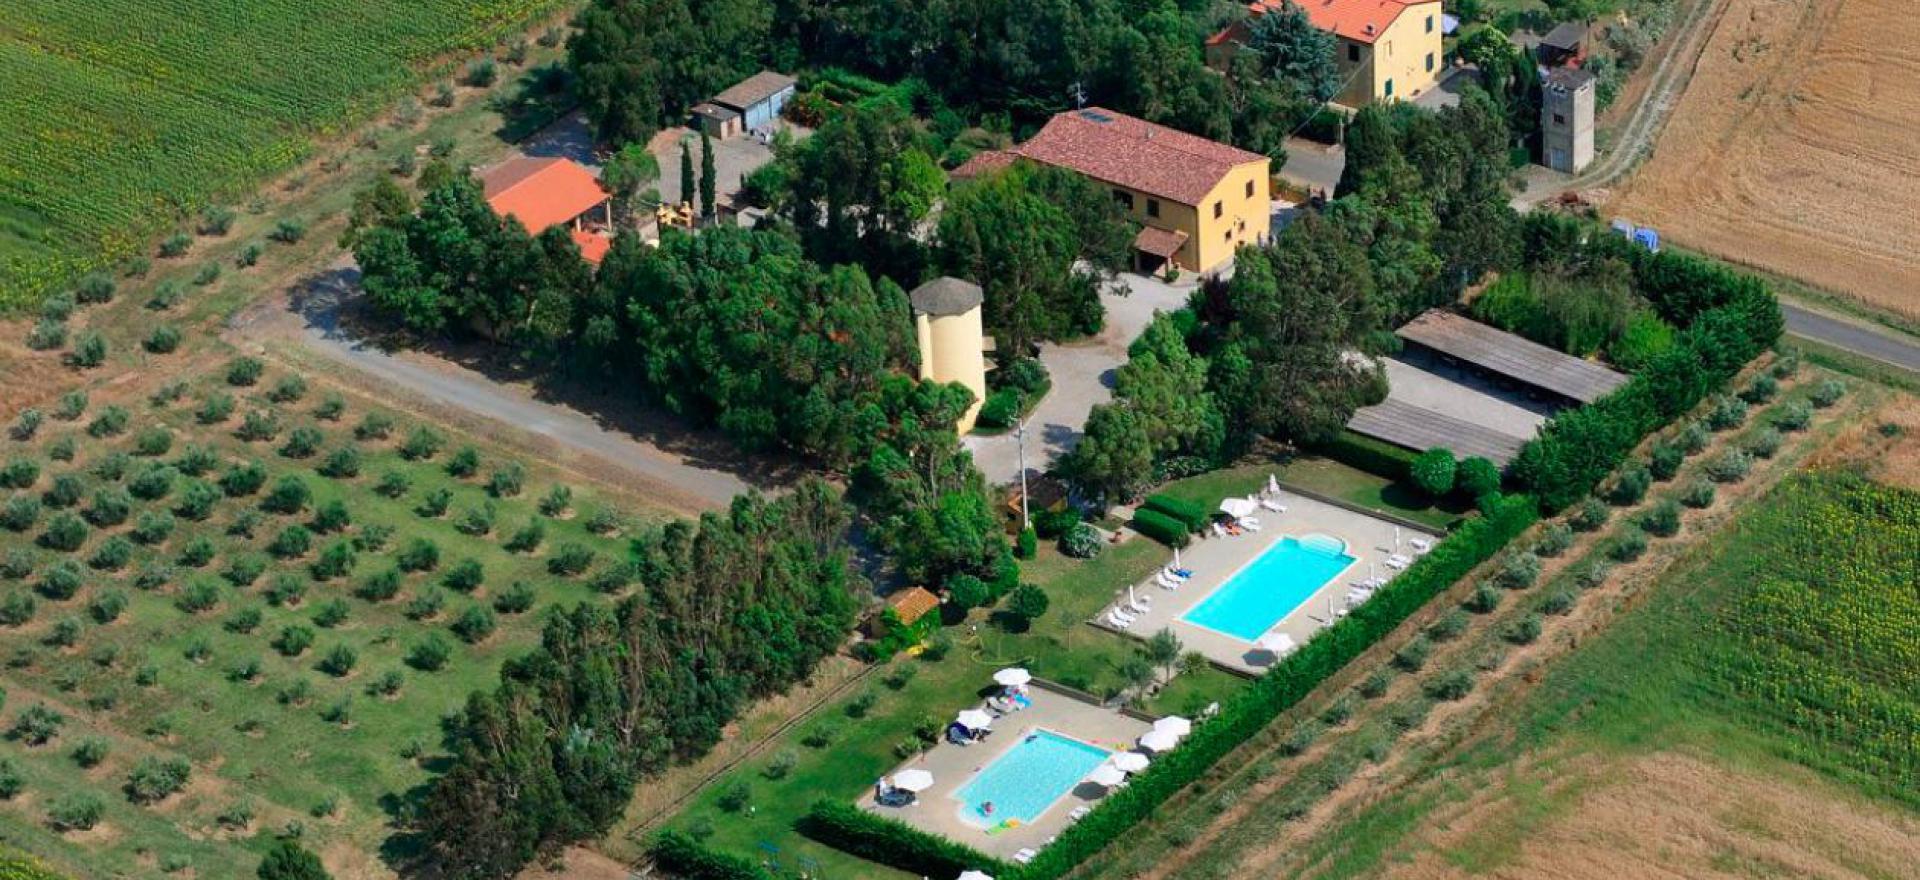 Agriturismo Toscane, kindvriendelijk en vlakbij het strand